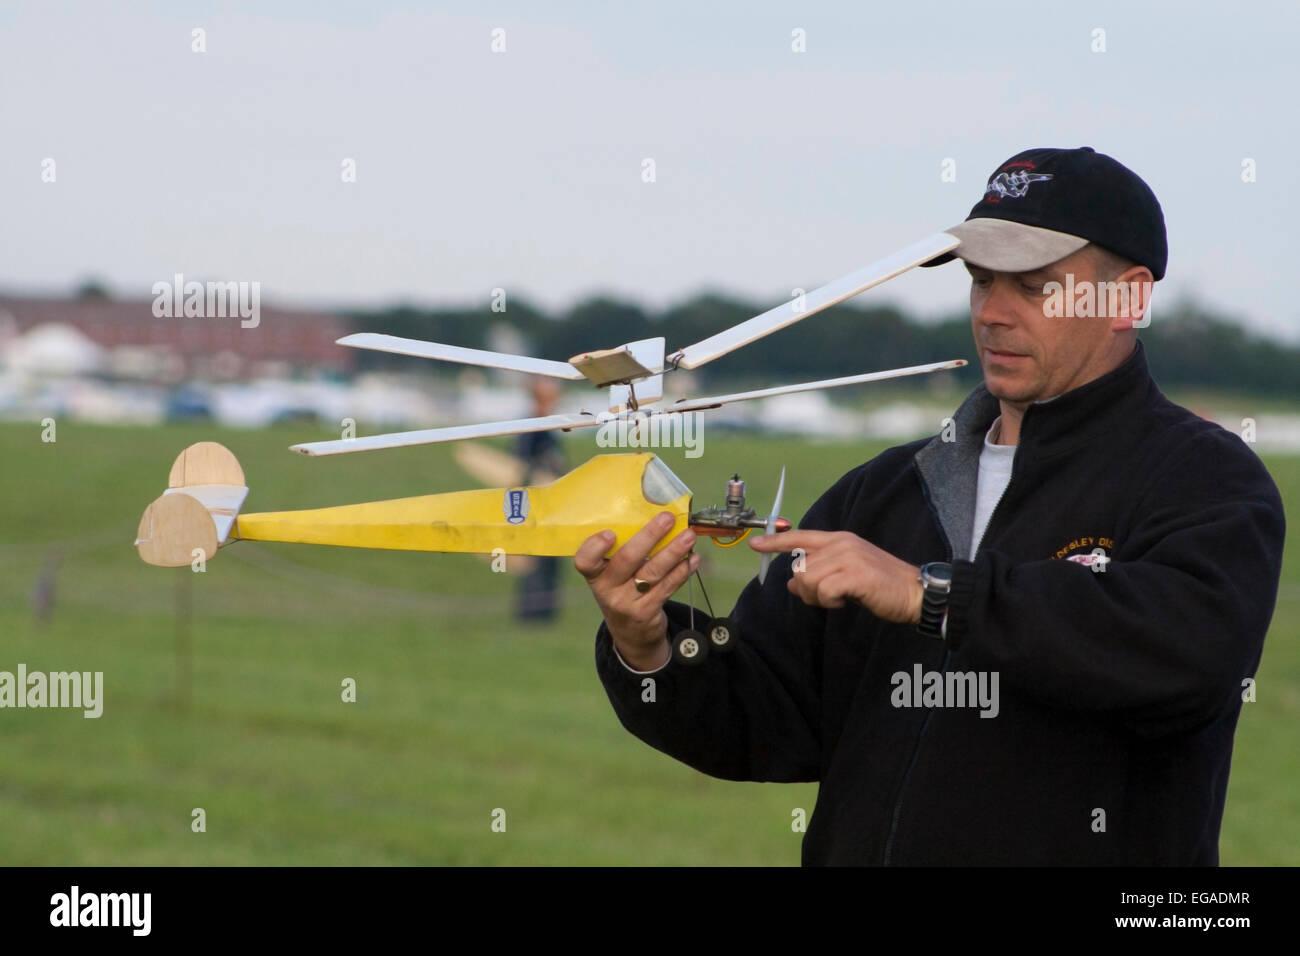 Self propelled model plane - Stock Image